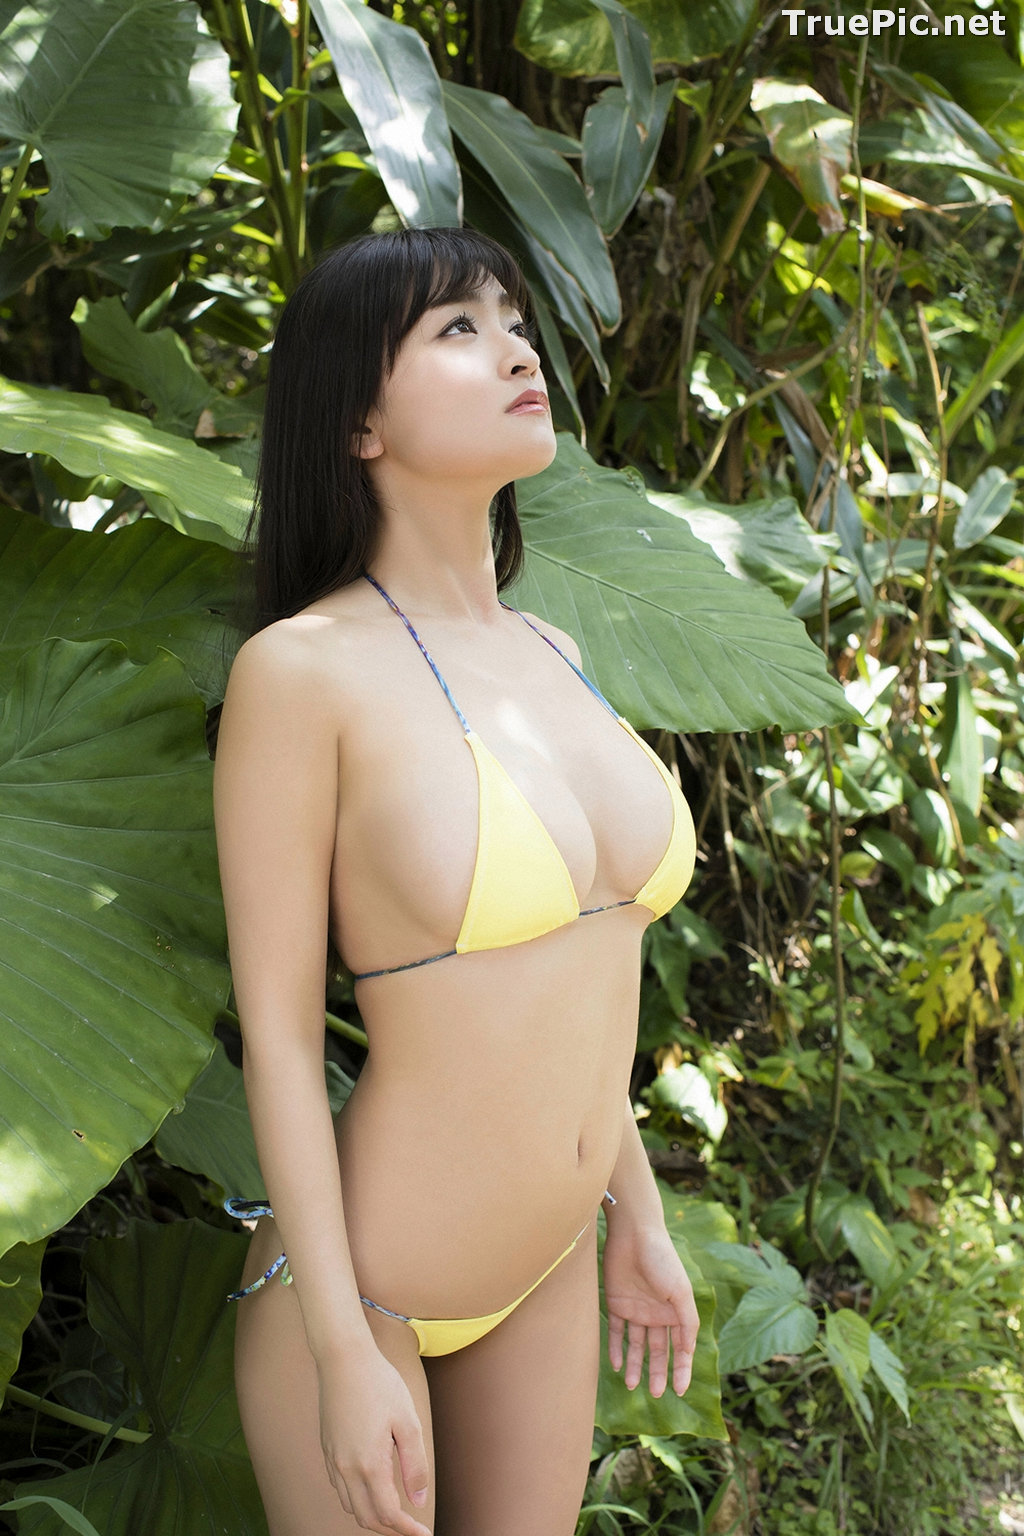 Image Japanese Idol Singer - Hoshino Manami - [YS-Web] Vol.834 - TruePic.net - Picture-1